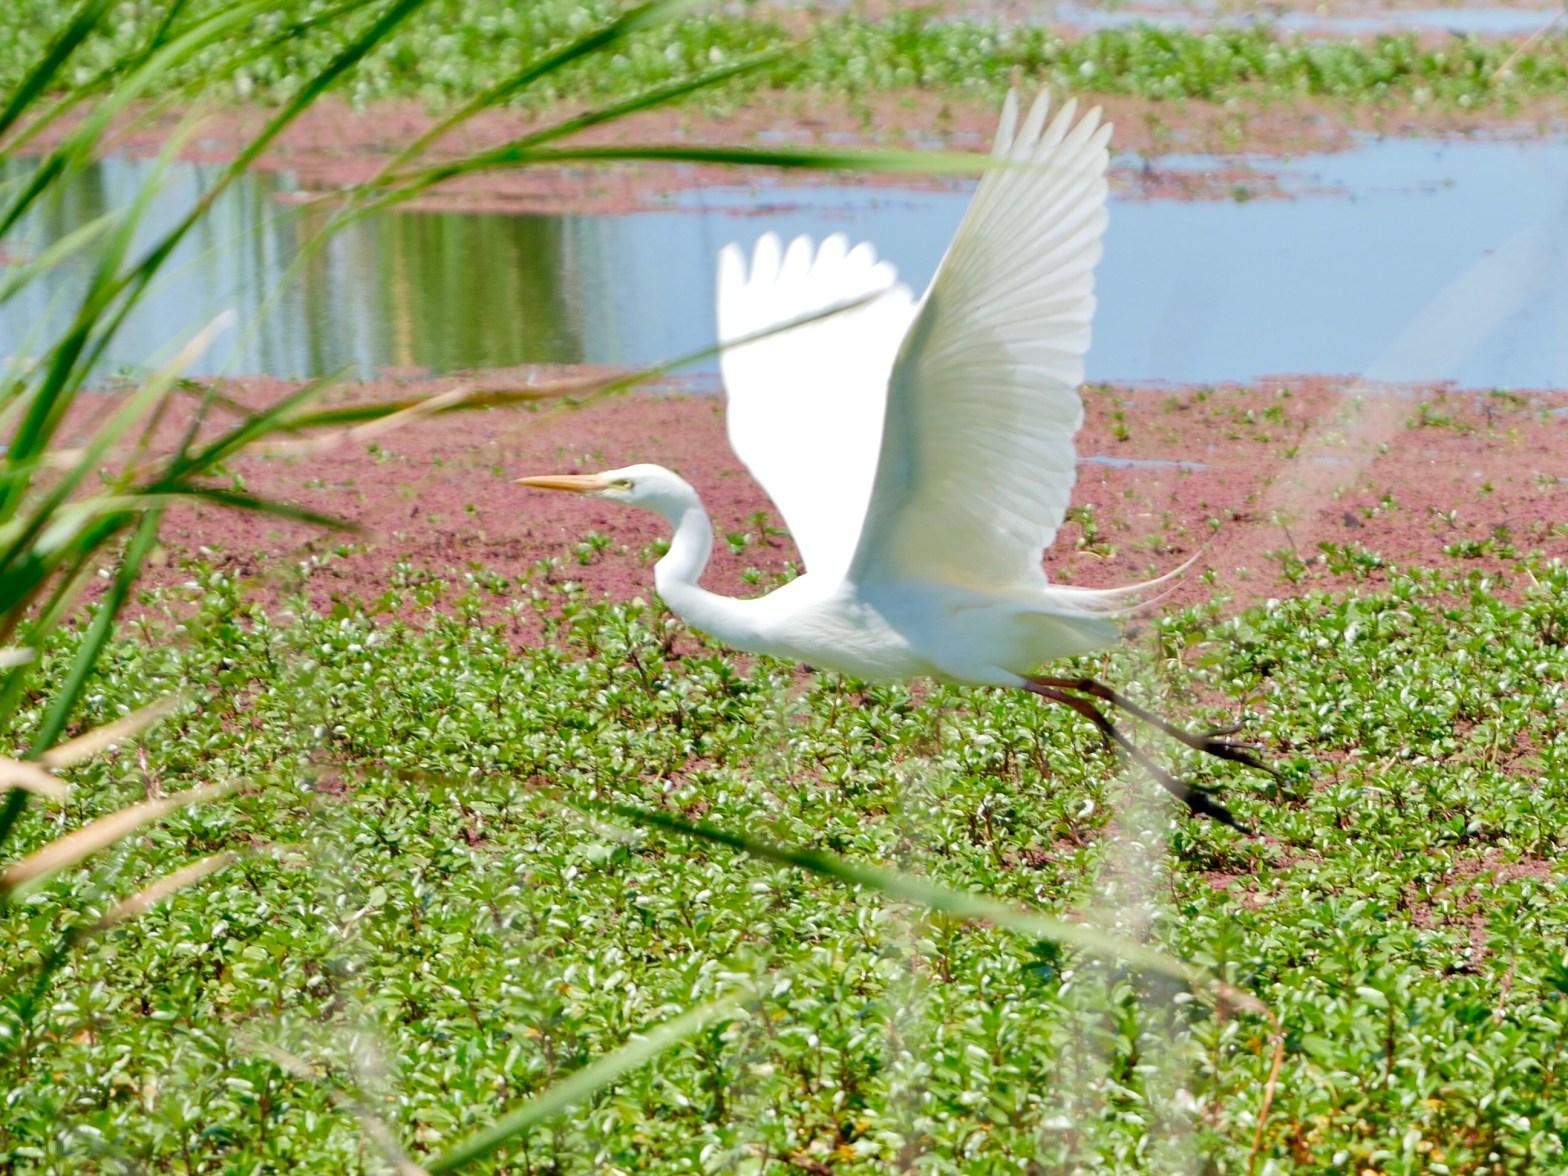 Intermediate egret on Willancorah wetland in the Macquarie Marshes